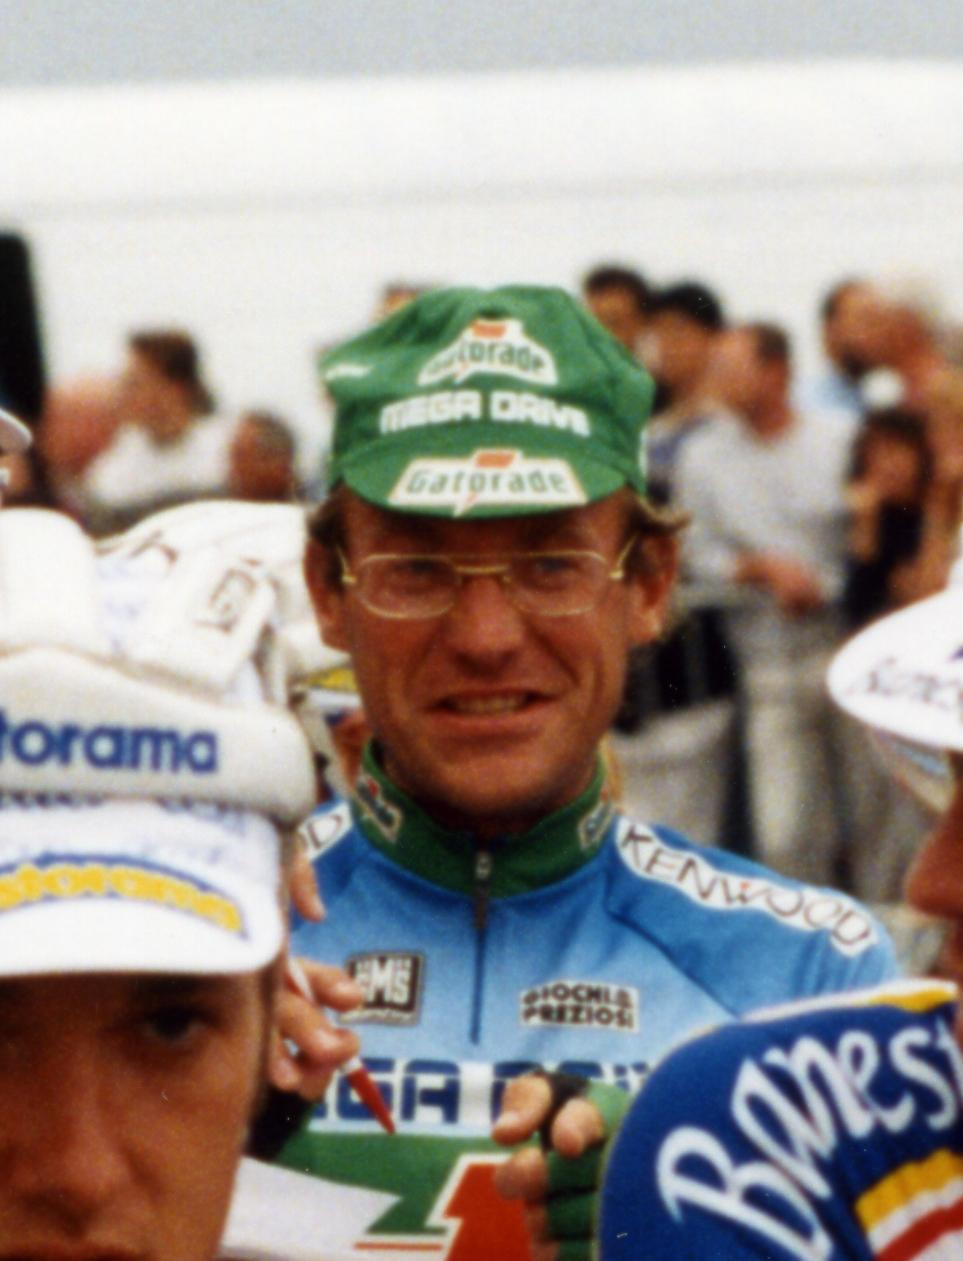 Laurent Fignon anno 1989